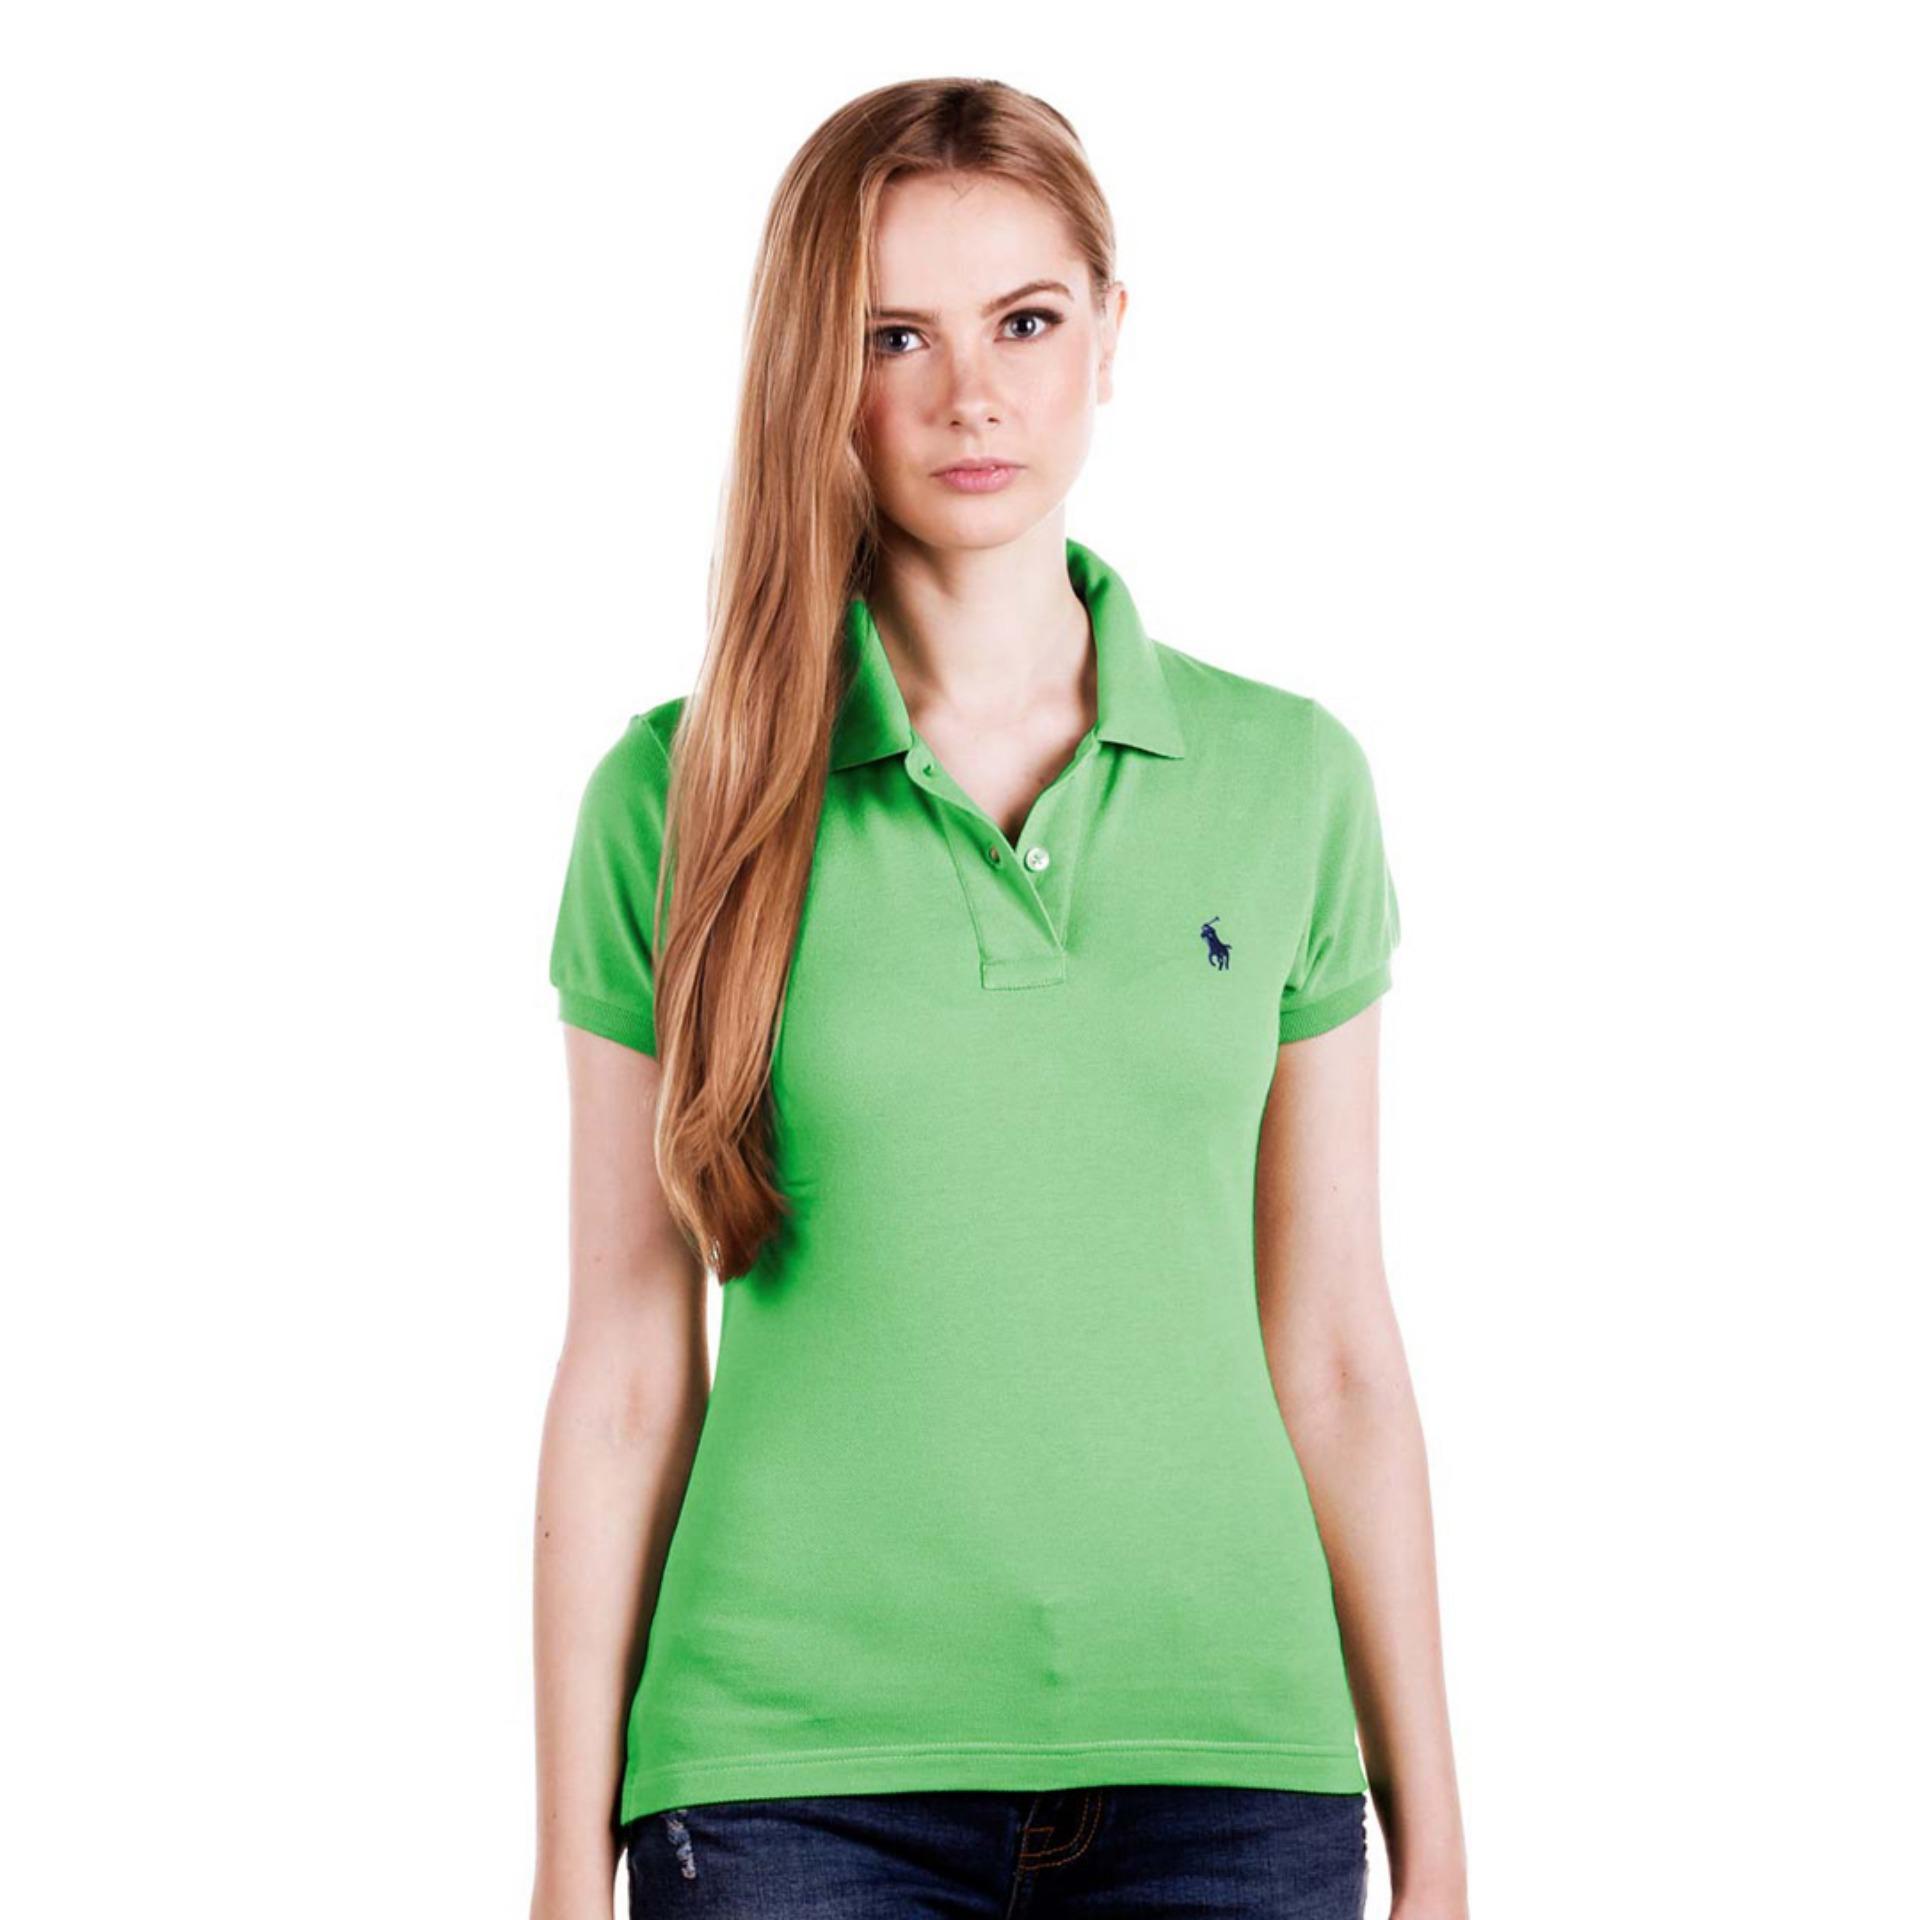 POLO RALPH LAUREN - POLO SHIRT CLASSIC FIT S/S Tiller Green LADIES